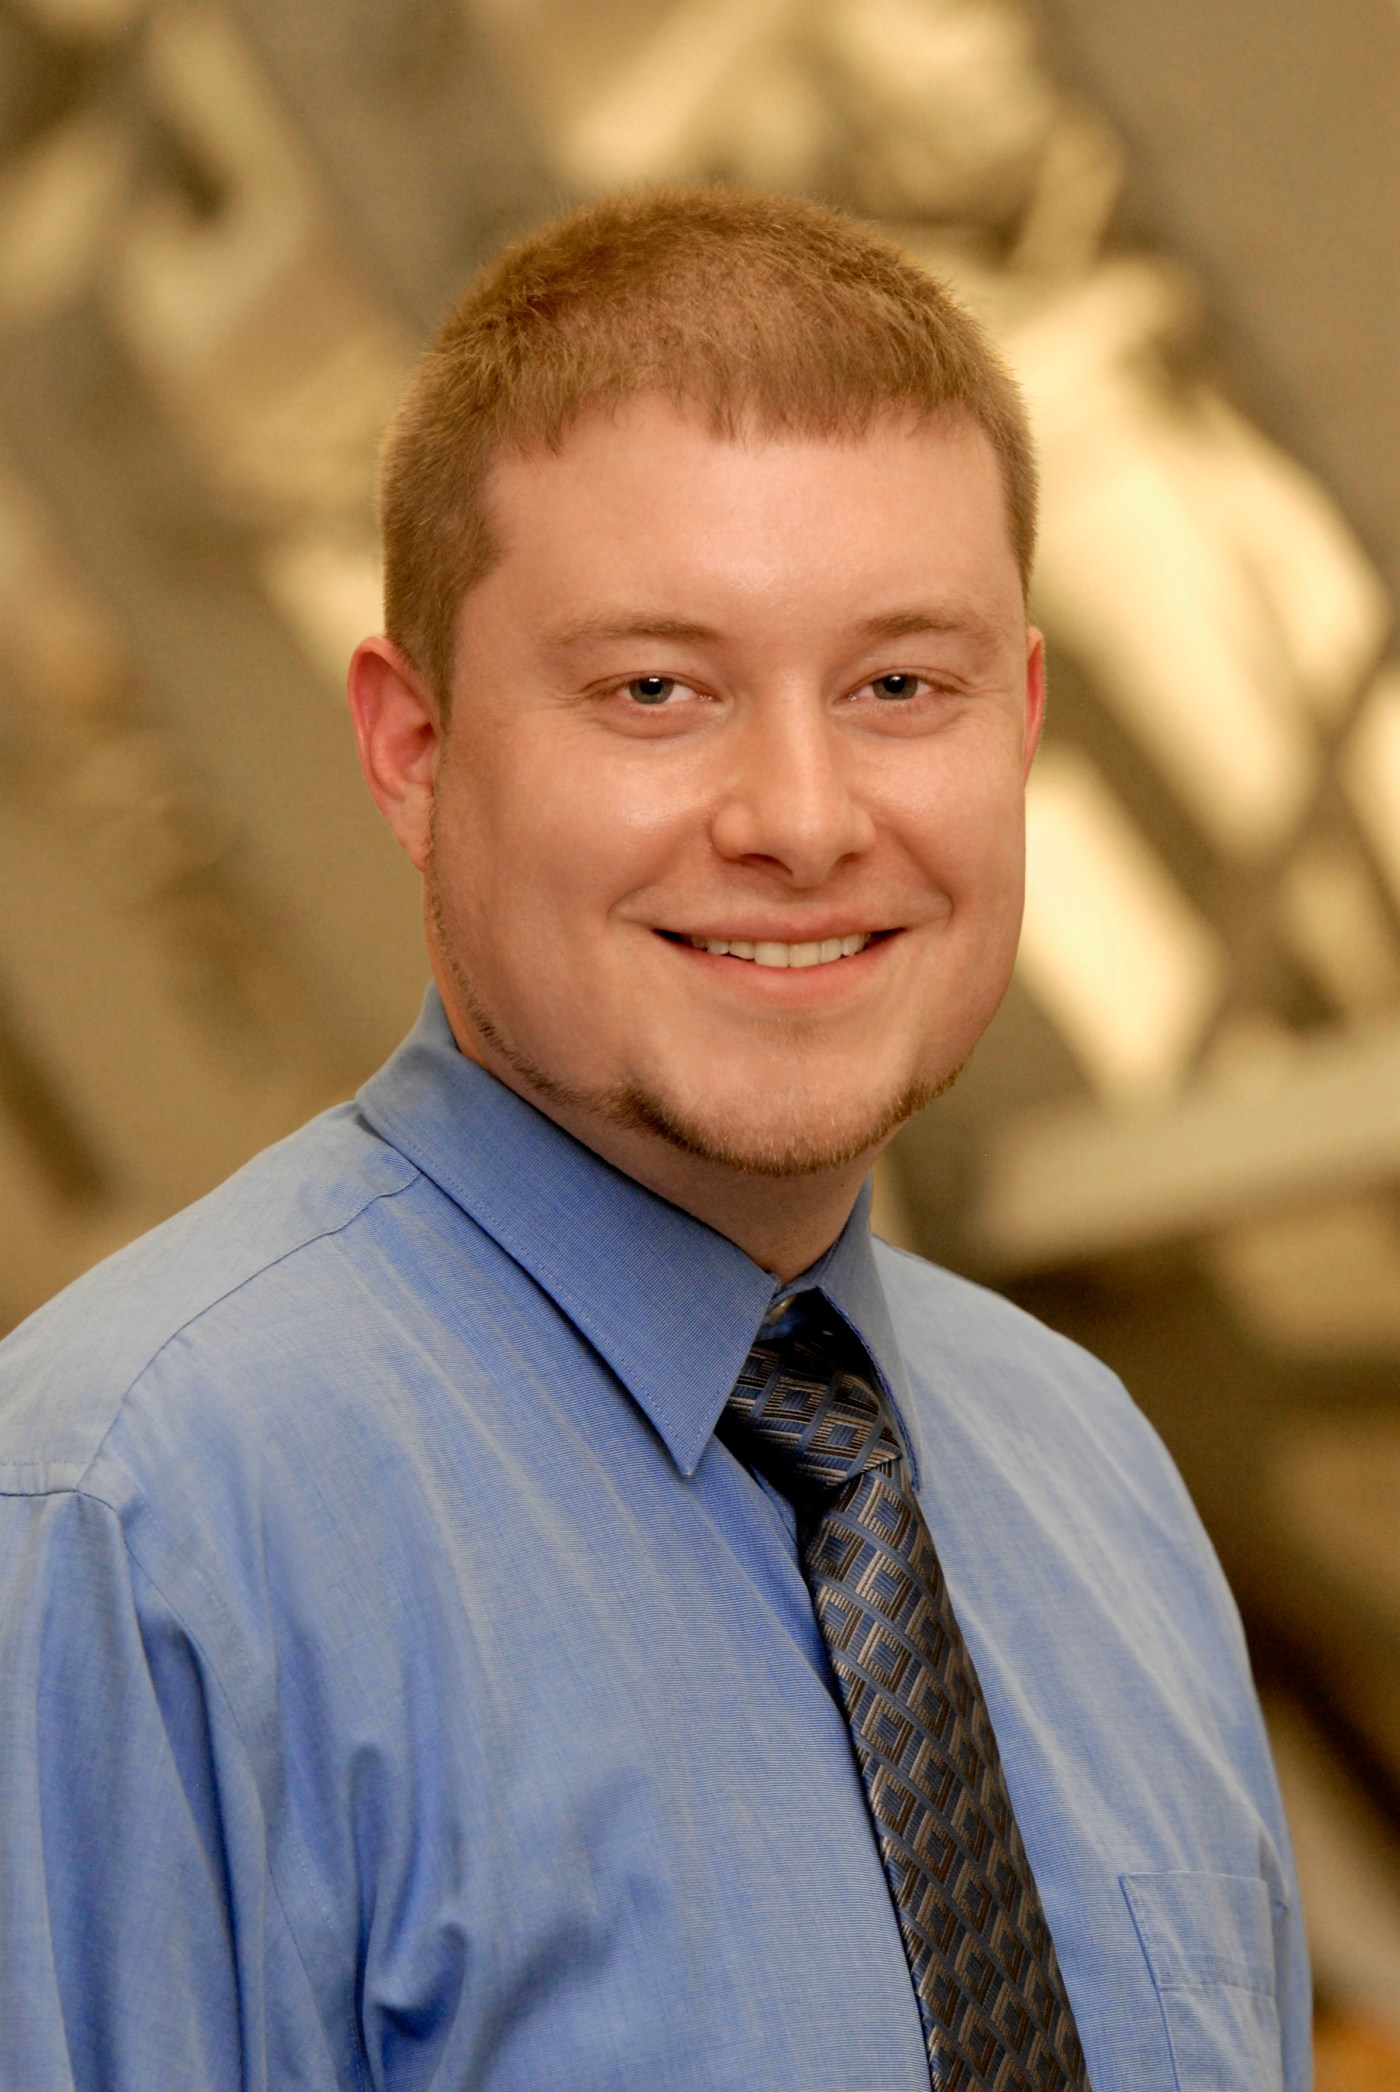 Mike Weissbrod AIA Principal